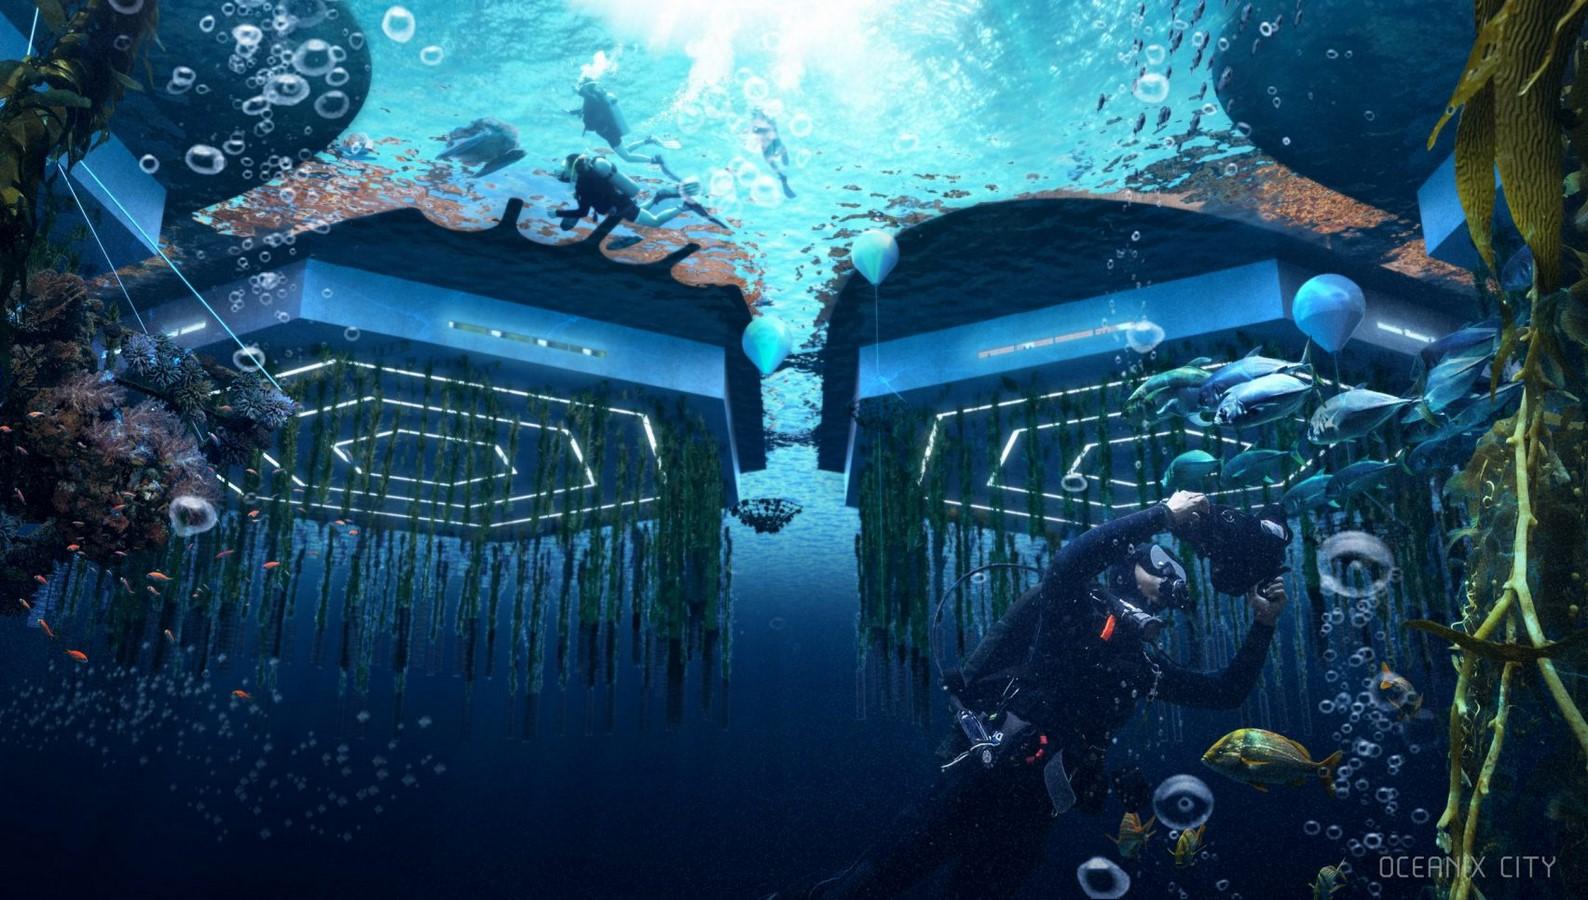 Oceanix City by Bjarke Ingles: The Floating City - Sheet3